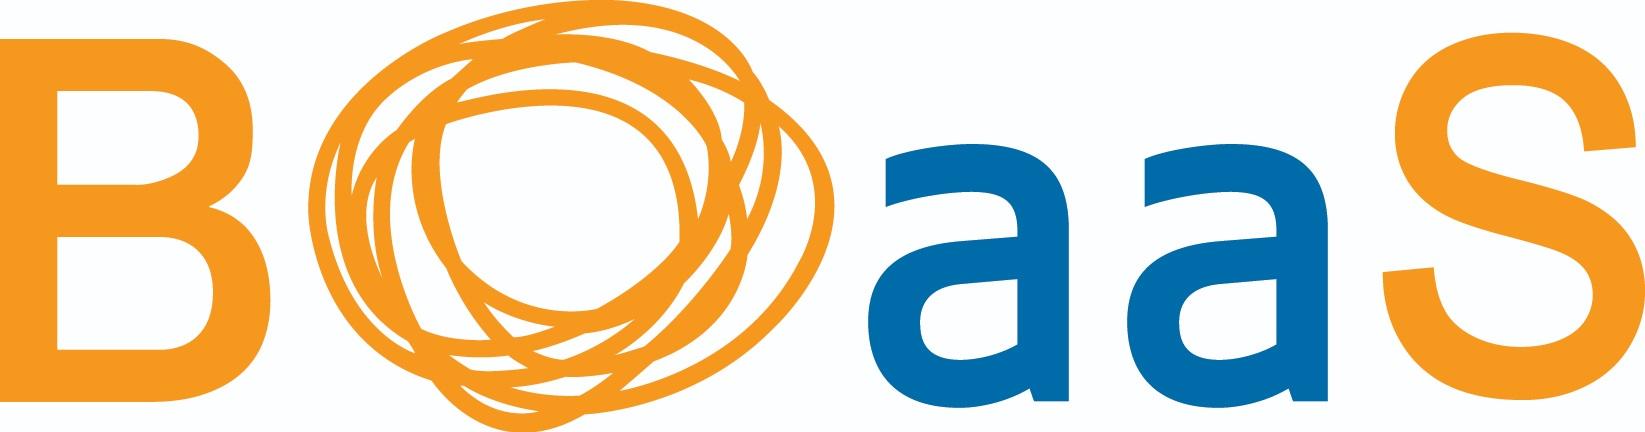 BOaaS-Logo.jpg